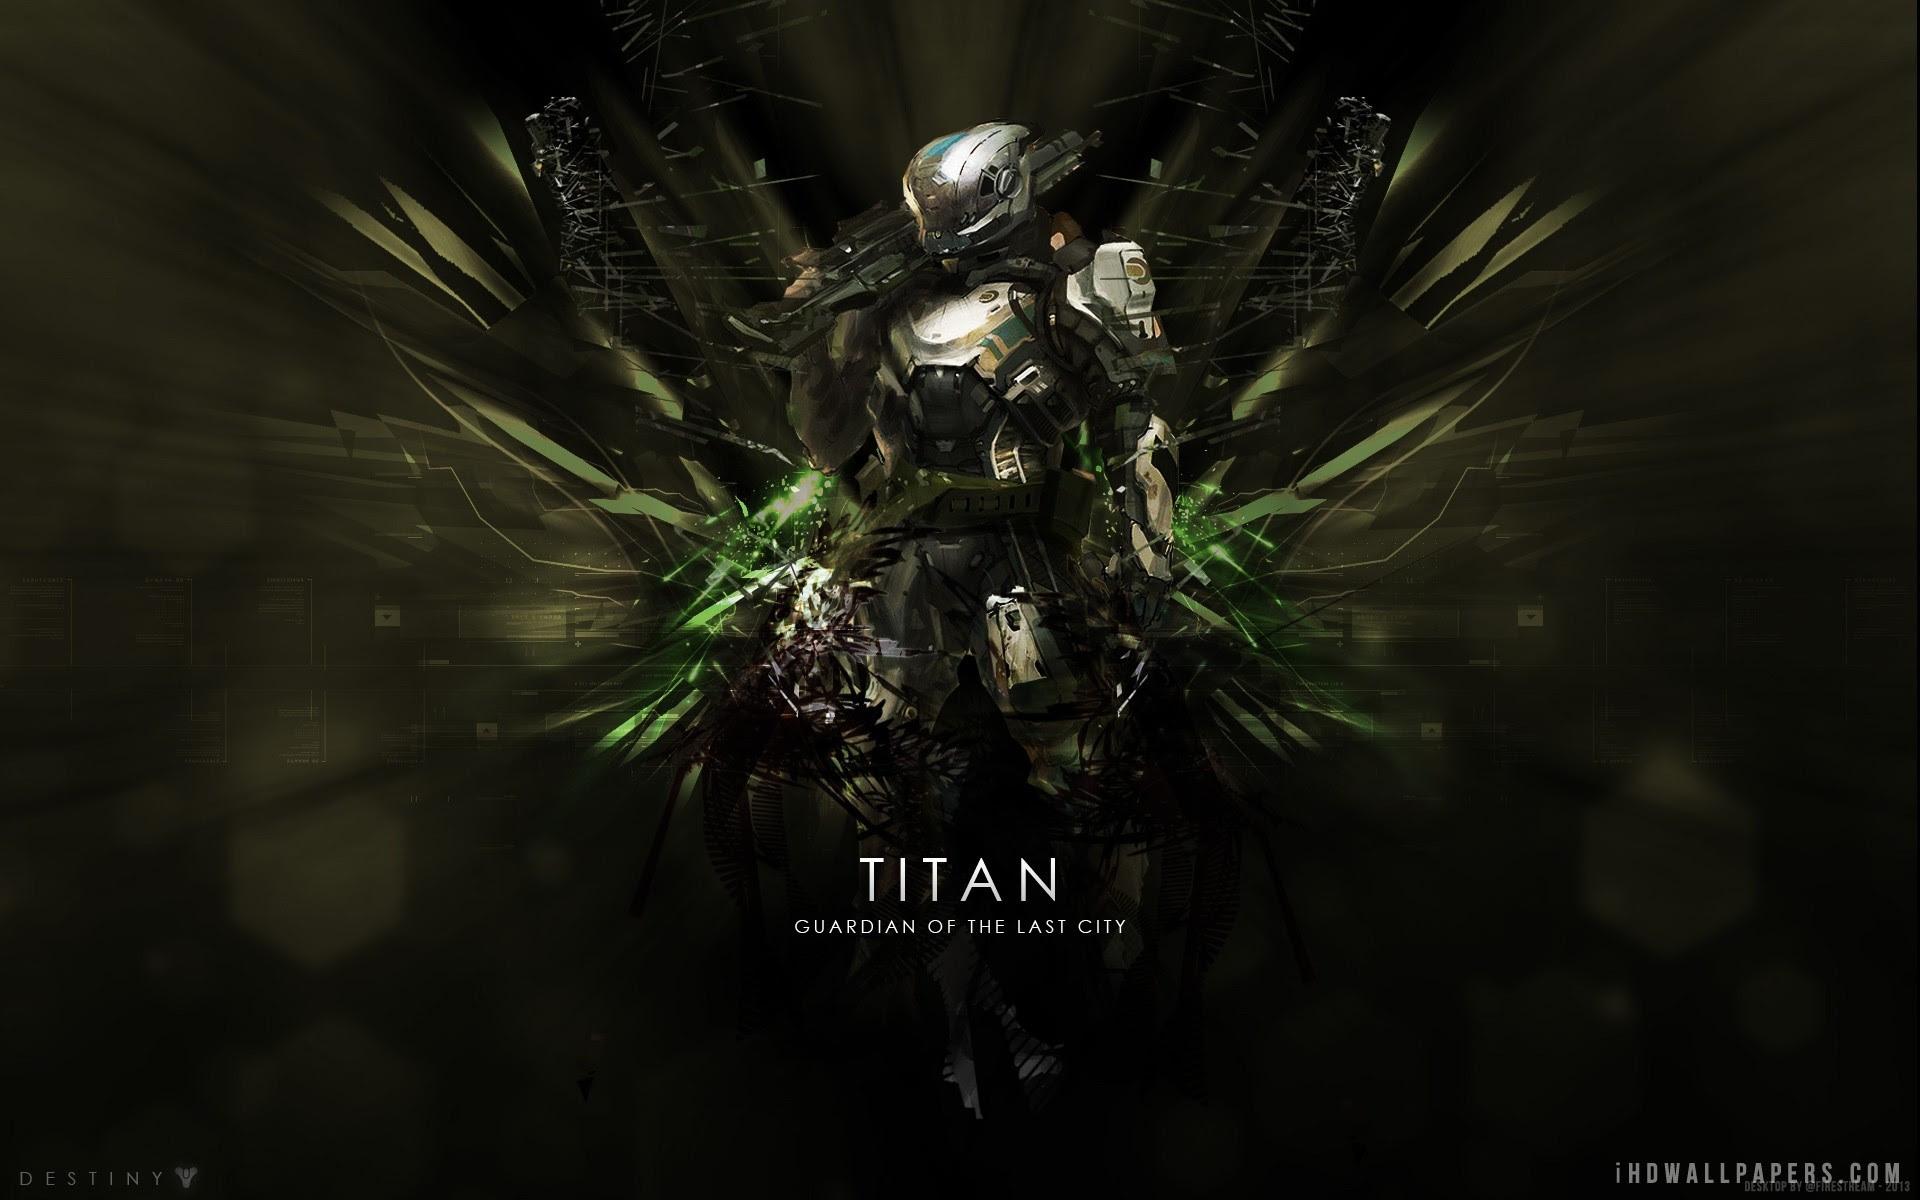 Home Screen Attack On Titan Iphone Wallpaper